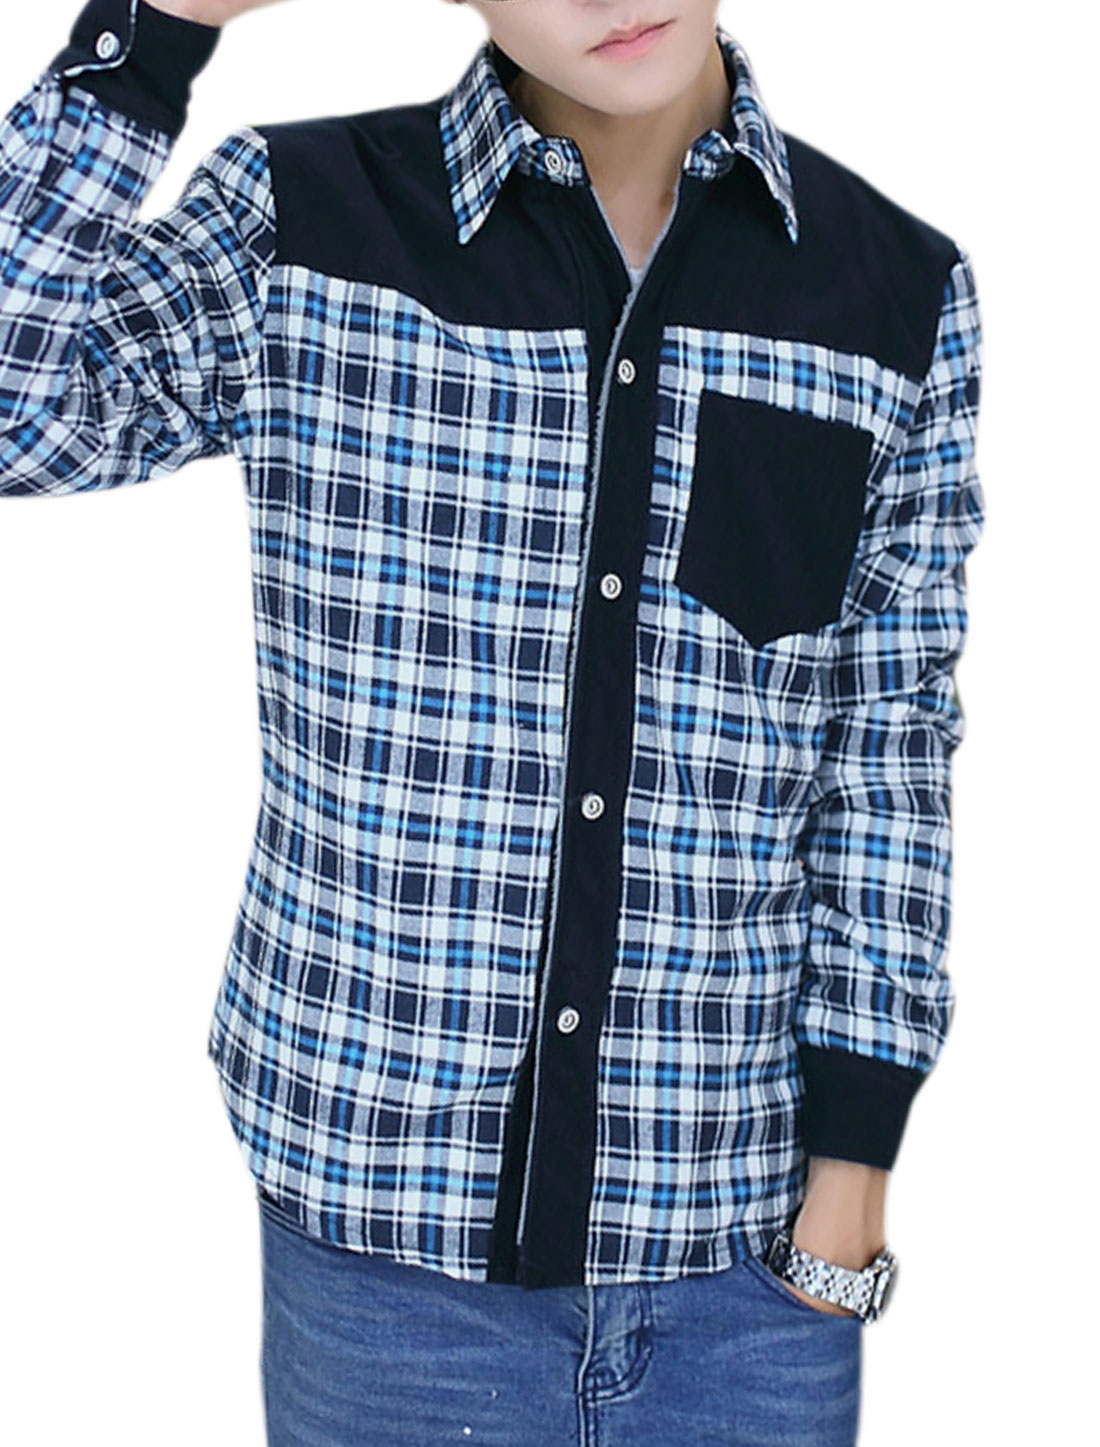 Men Checkered Pattern Corduroy Panel Fleece Lining Trendy Shirt Blue White M